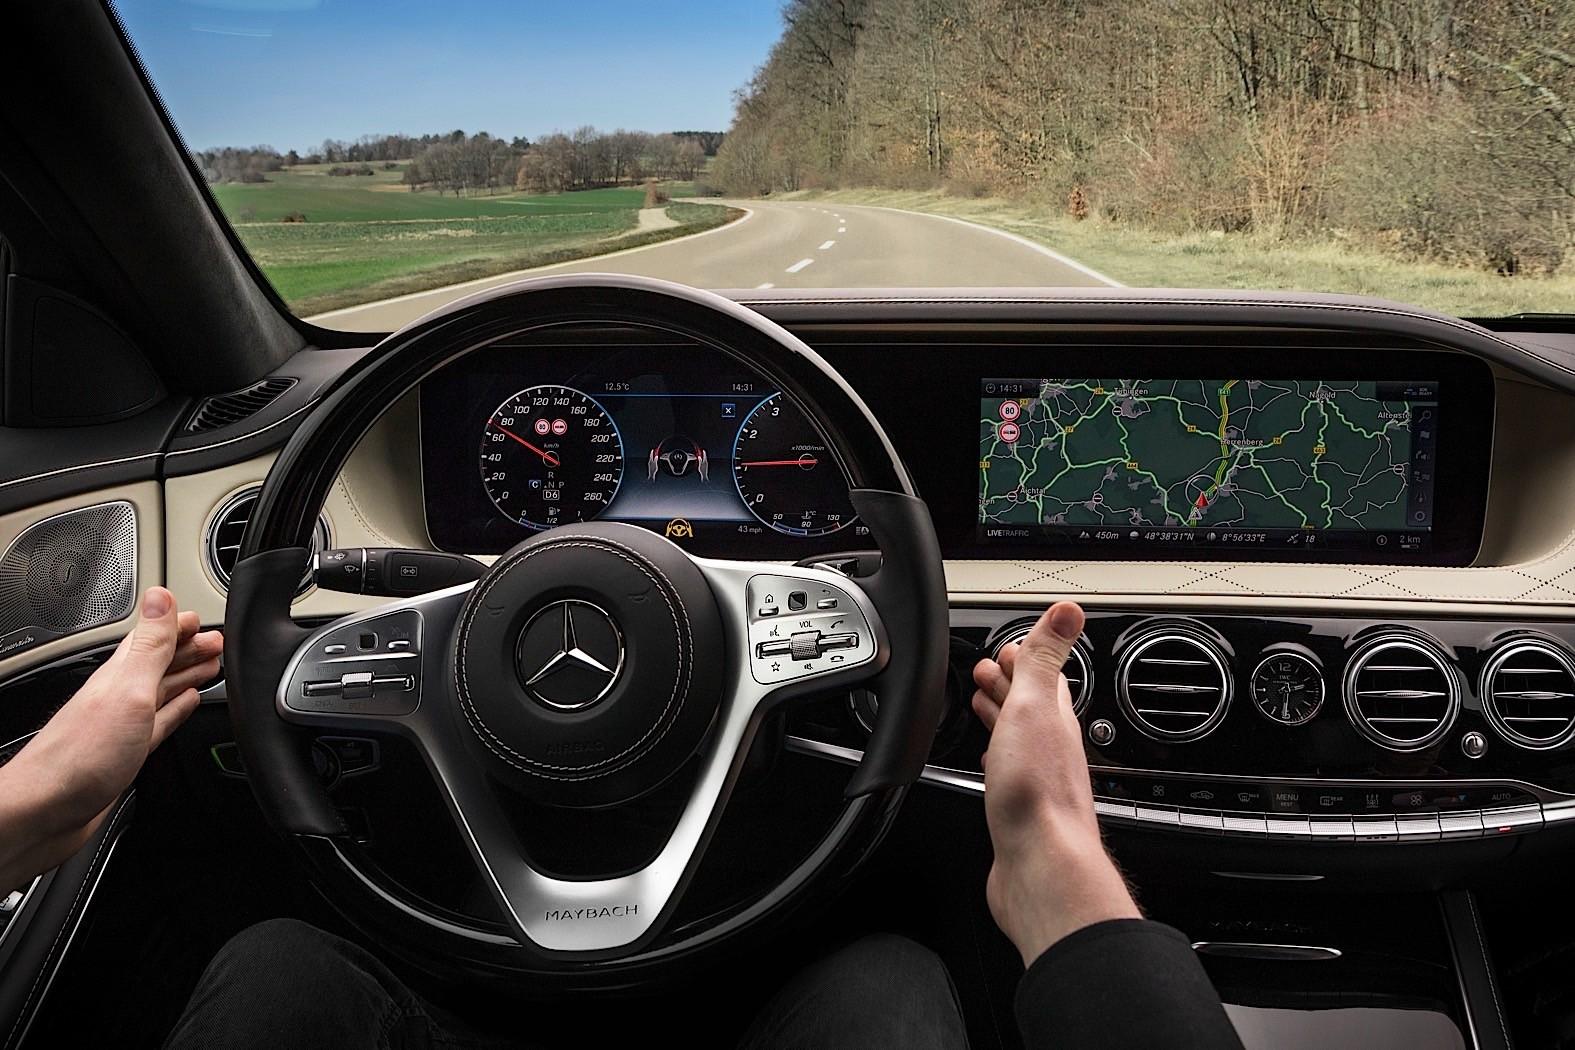 Mercedes-Benz Announces 2018 S-Class German Pricing, Starts